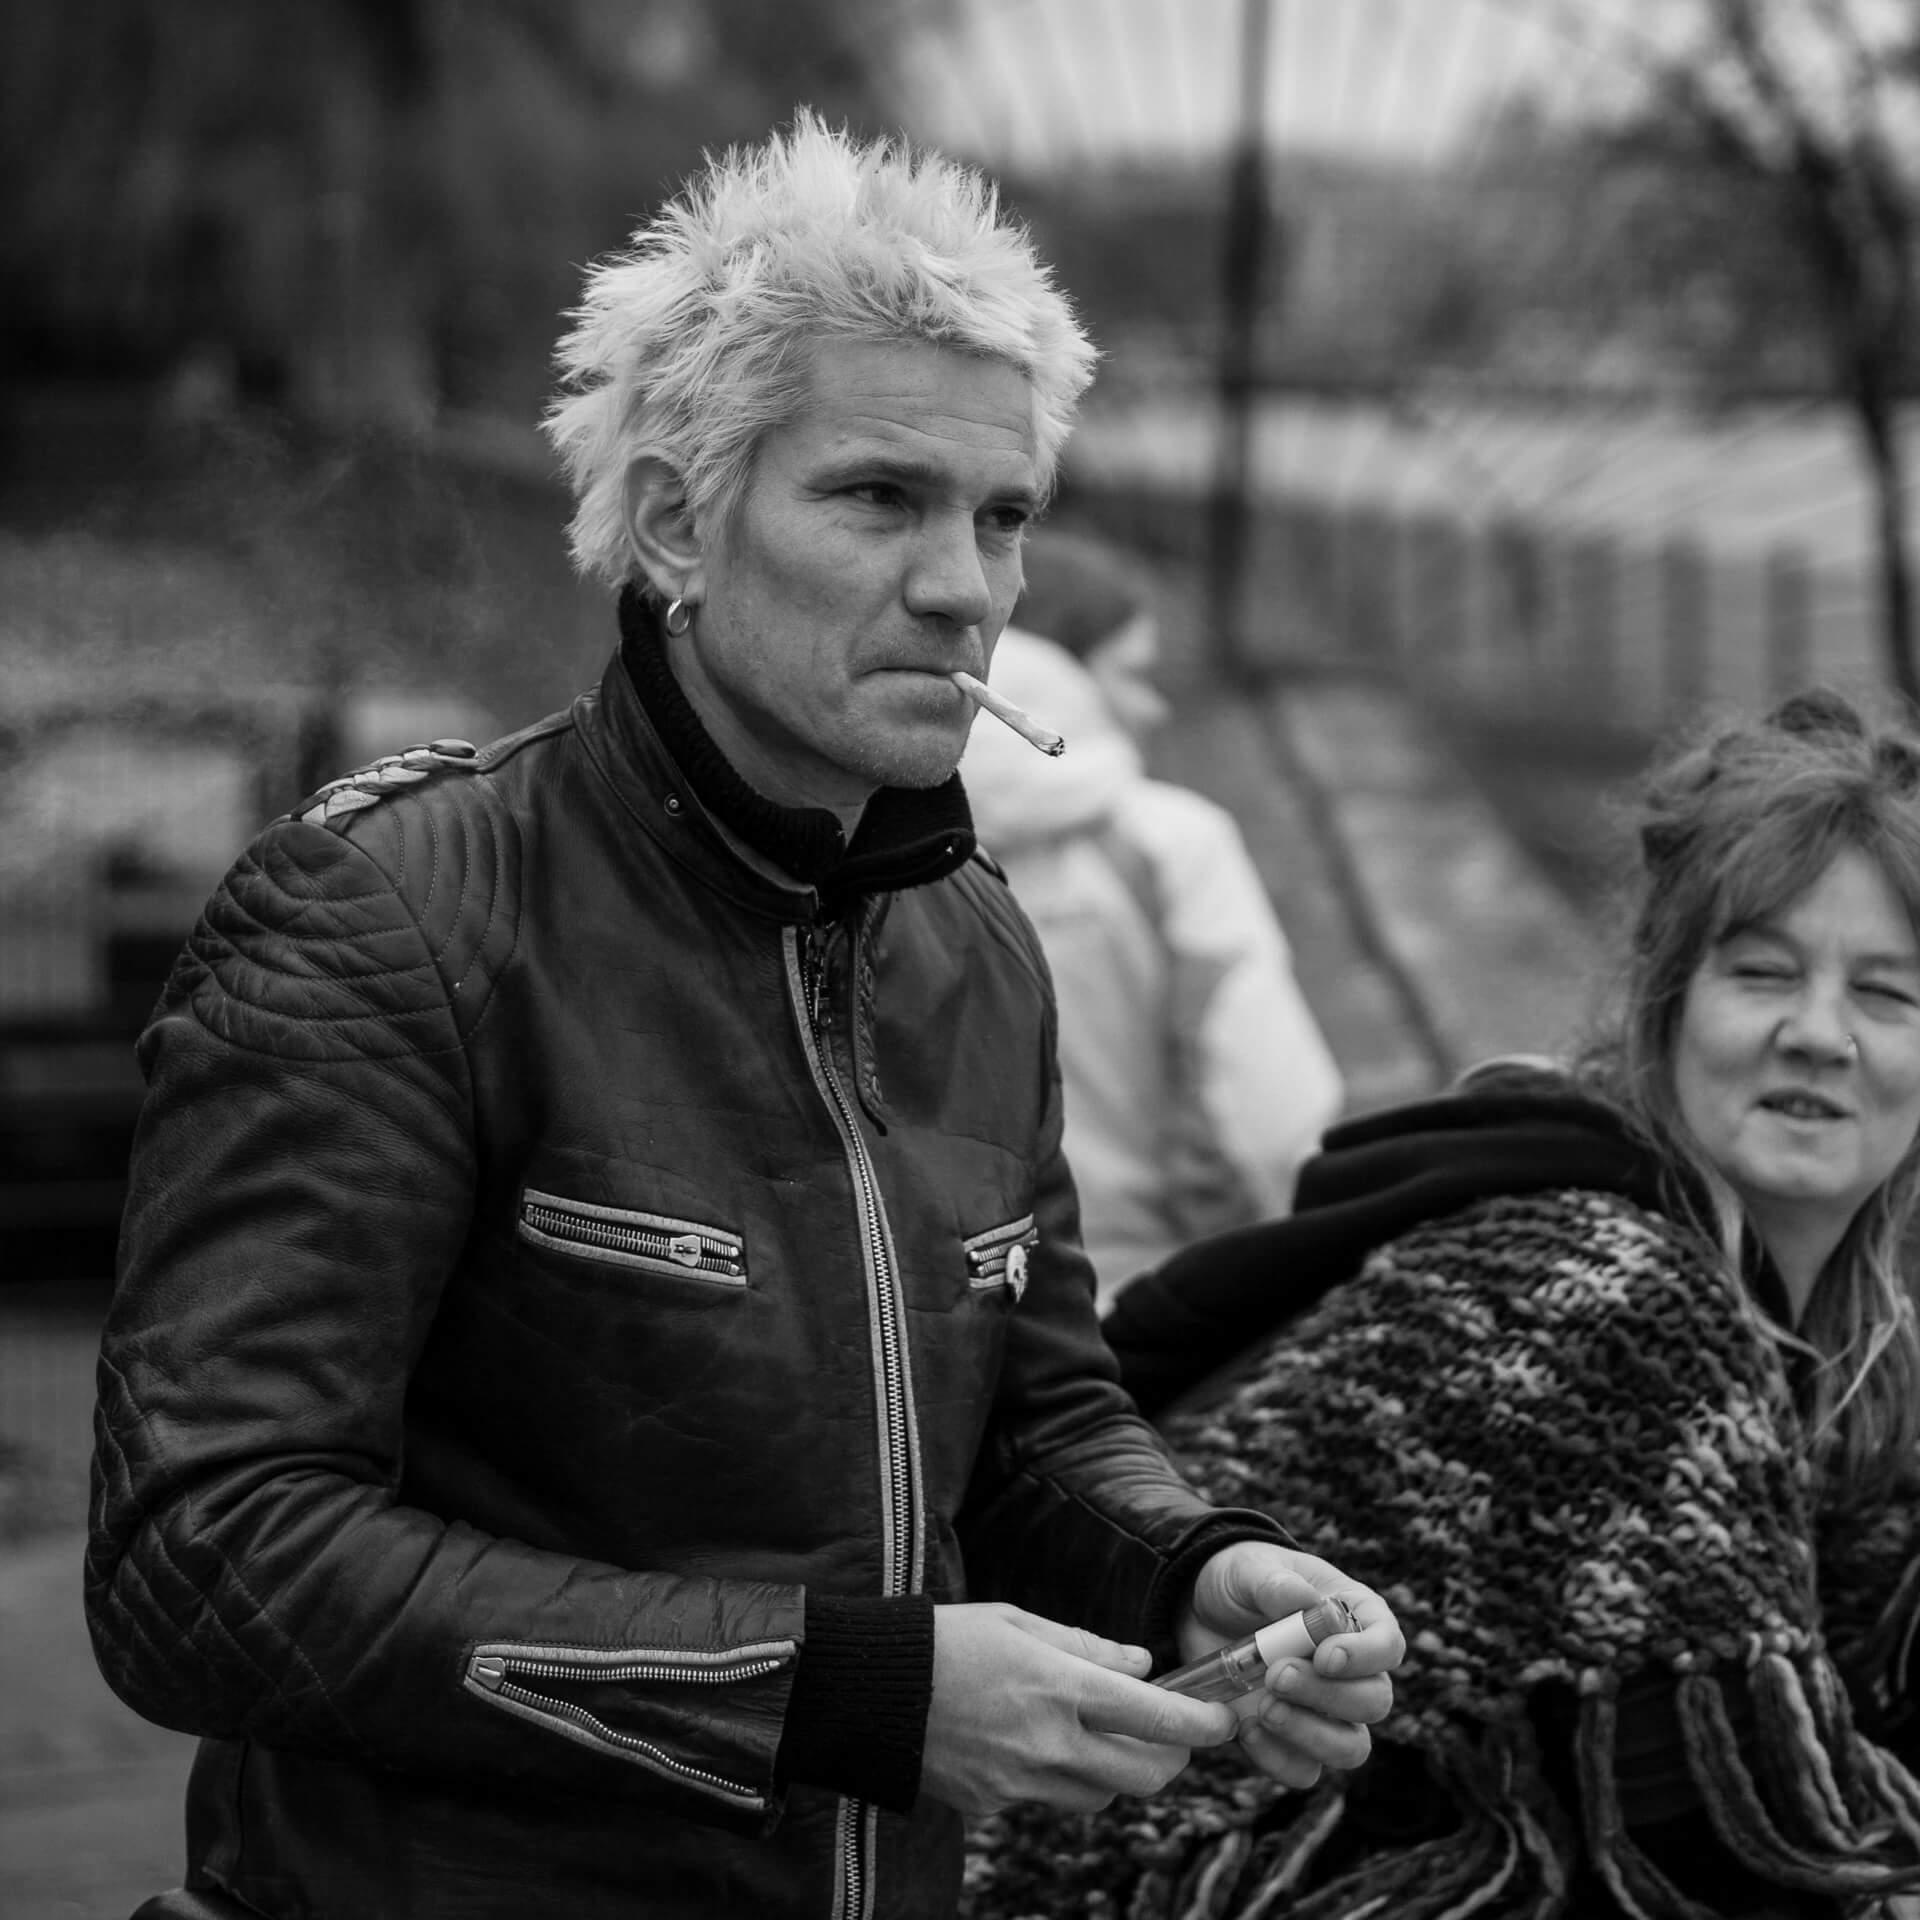 Street Photography - Christian Weber Photo | München